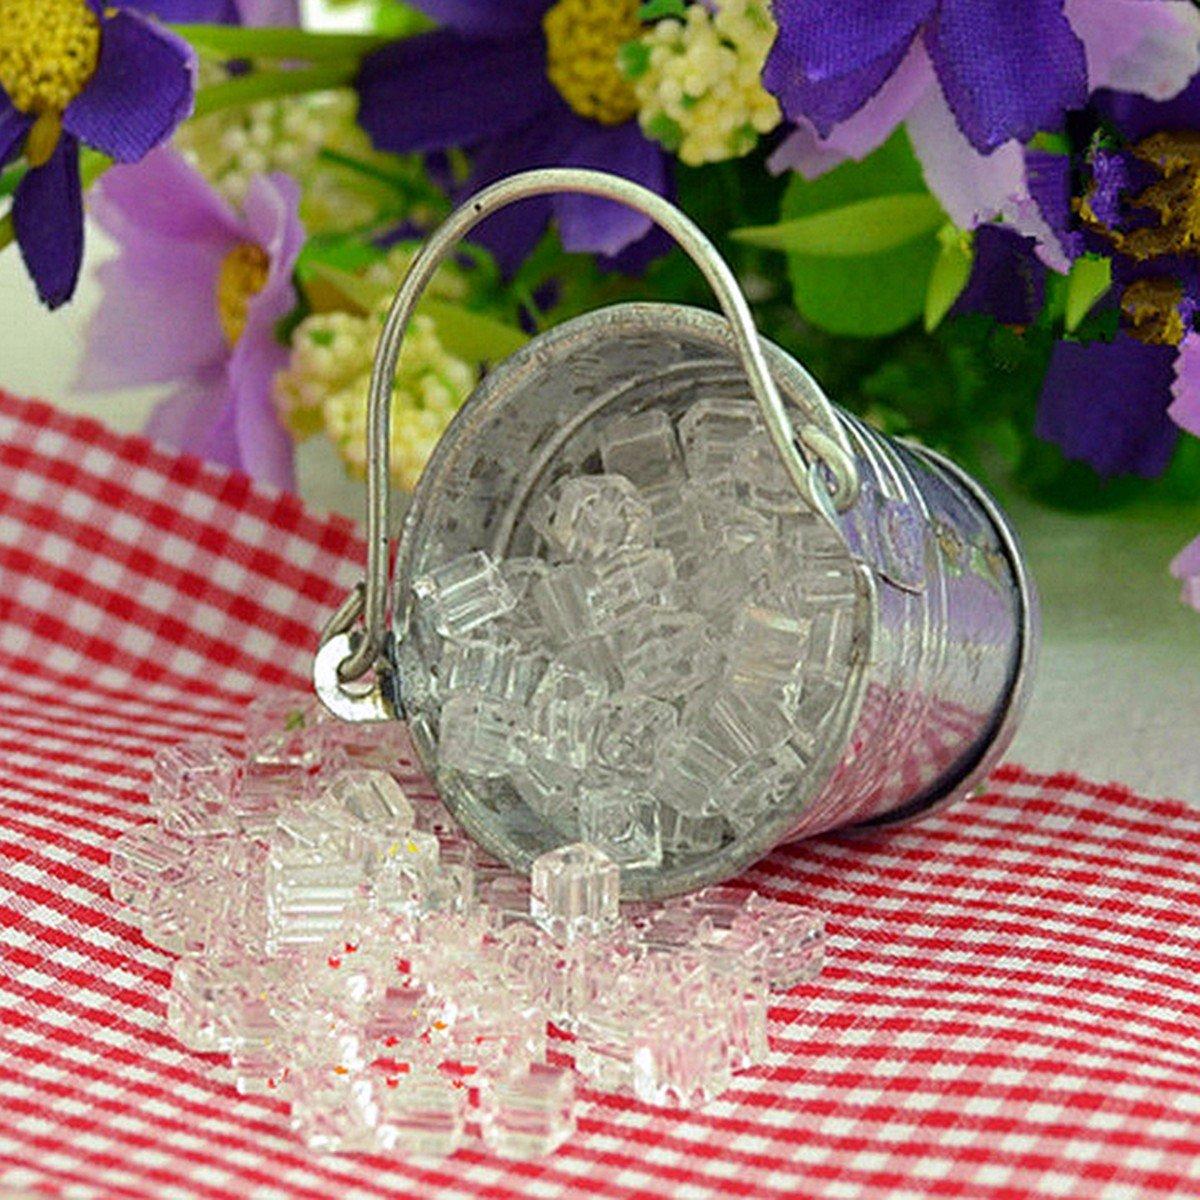 Home Mini Ice Cube Dollhouse Accessories Miniature Iron Pail